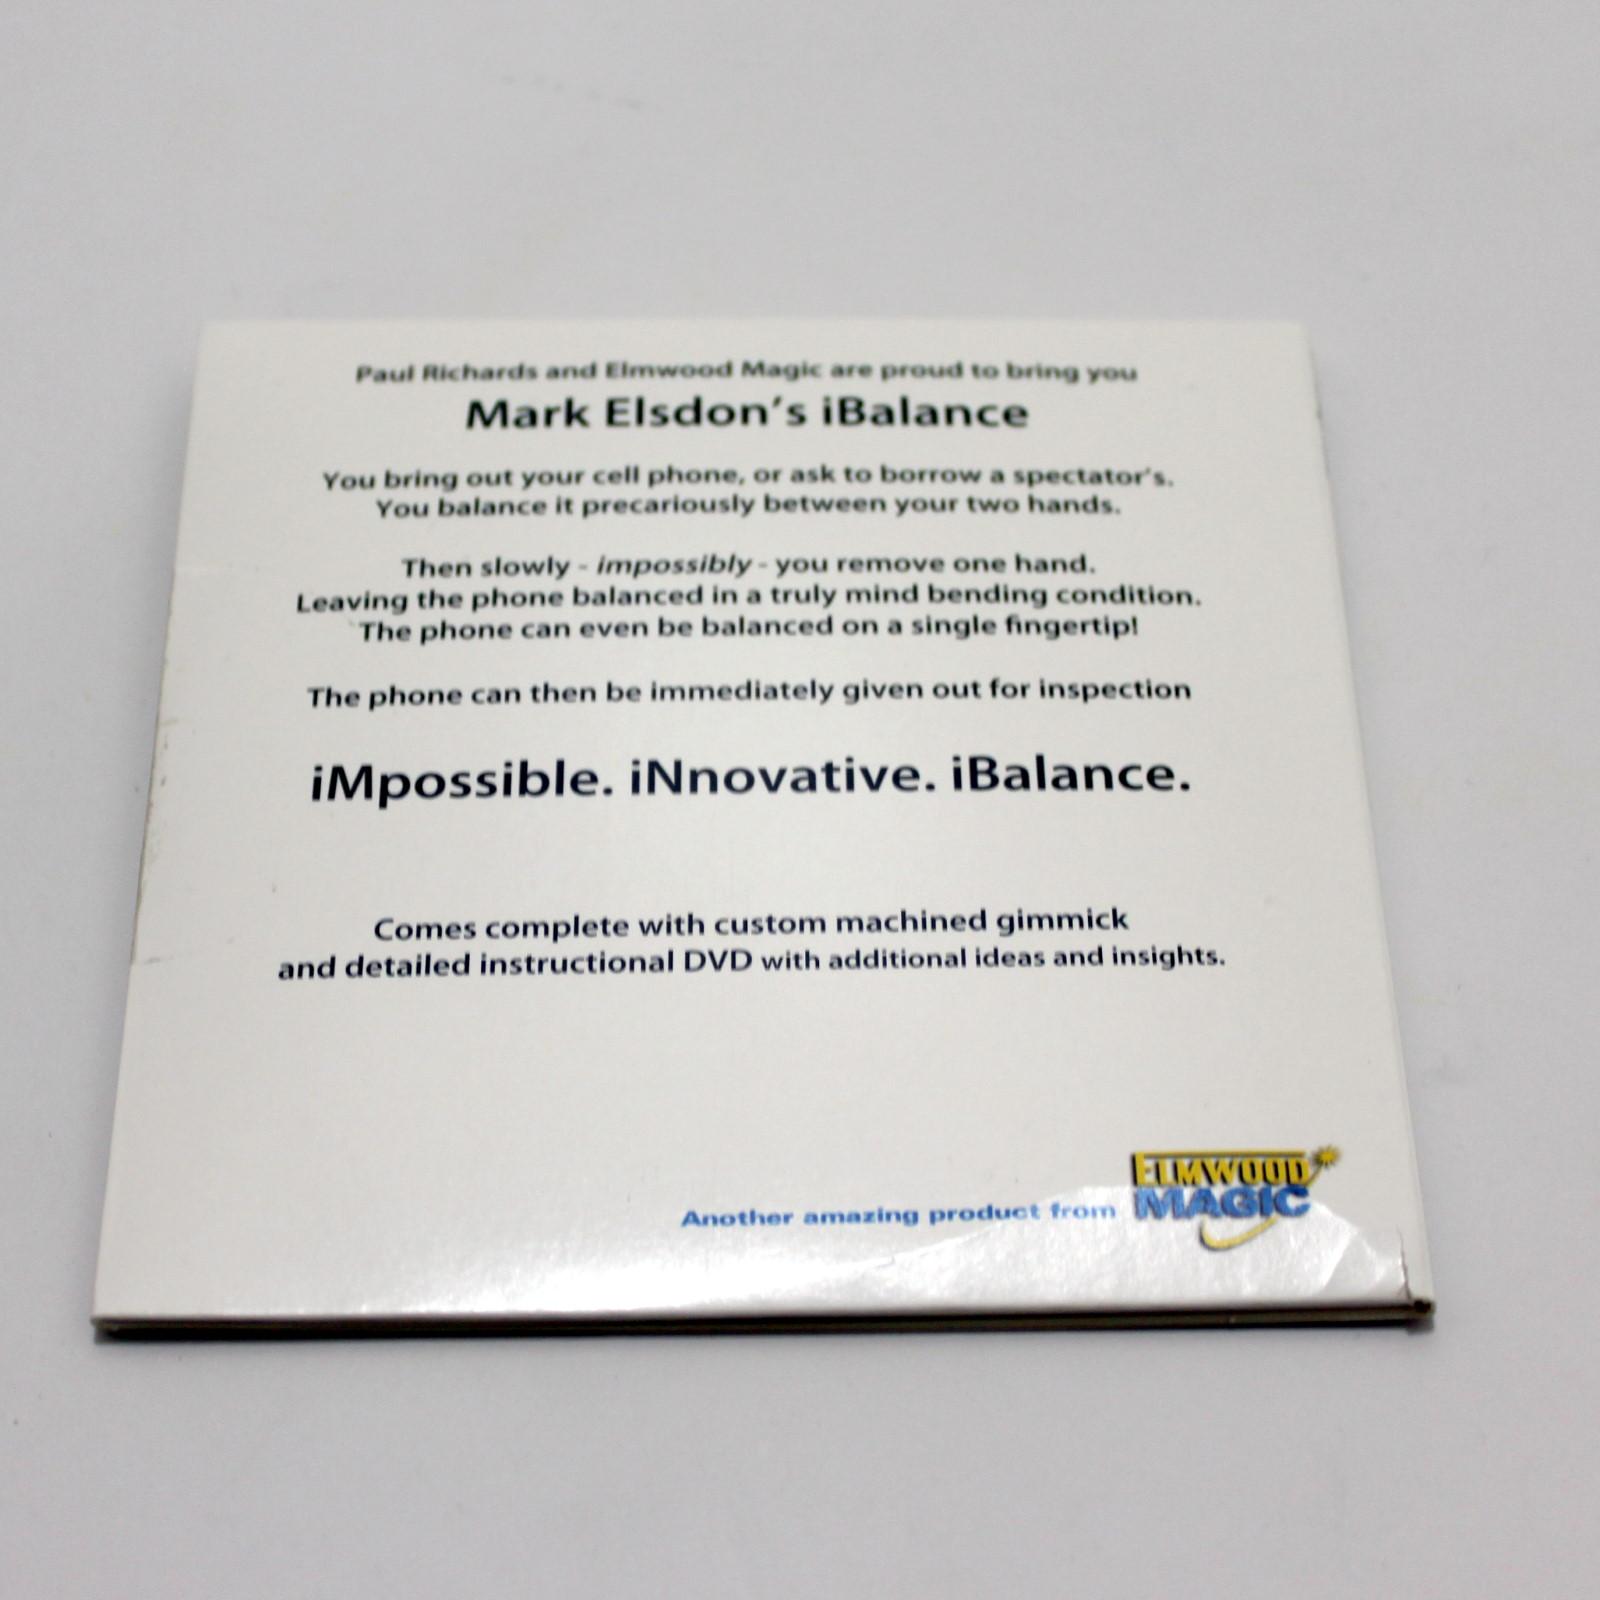 iBalance by Mark Elsdon